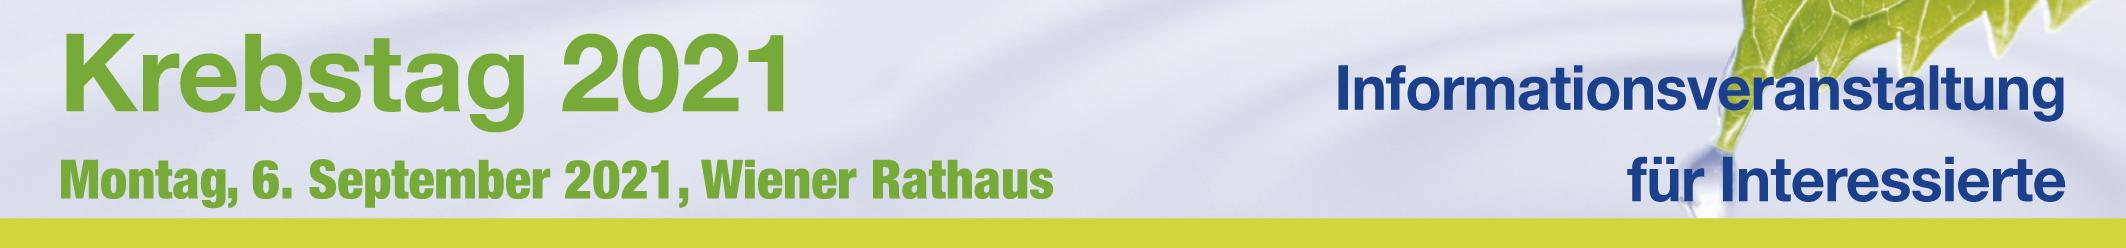 Wiener Krebstag 2021 - Informationsveranstaltung